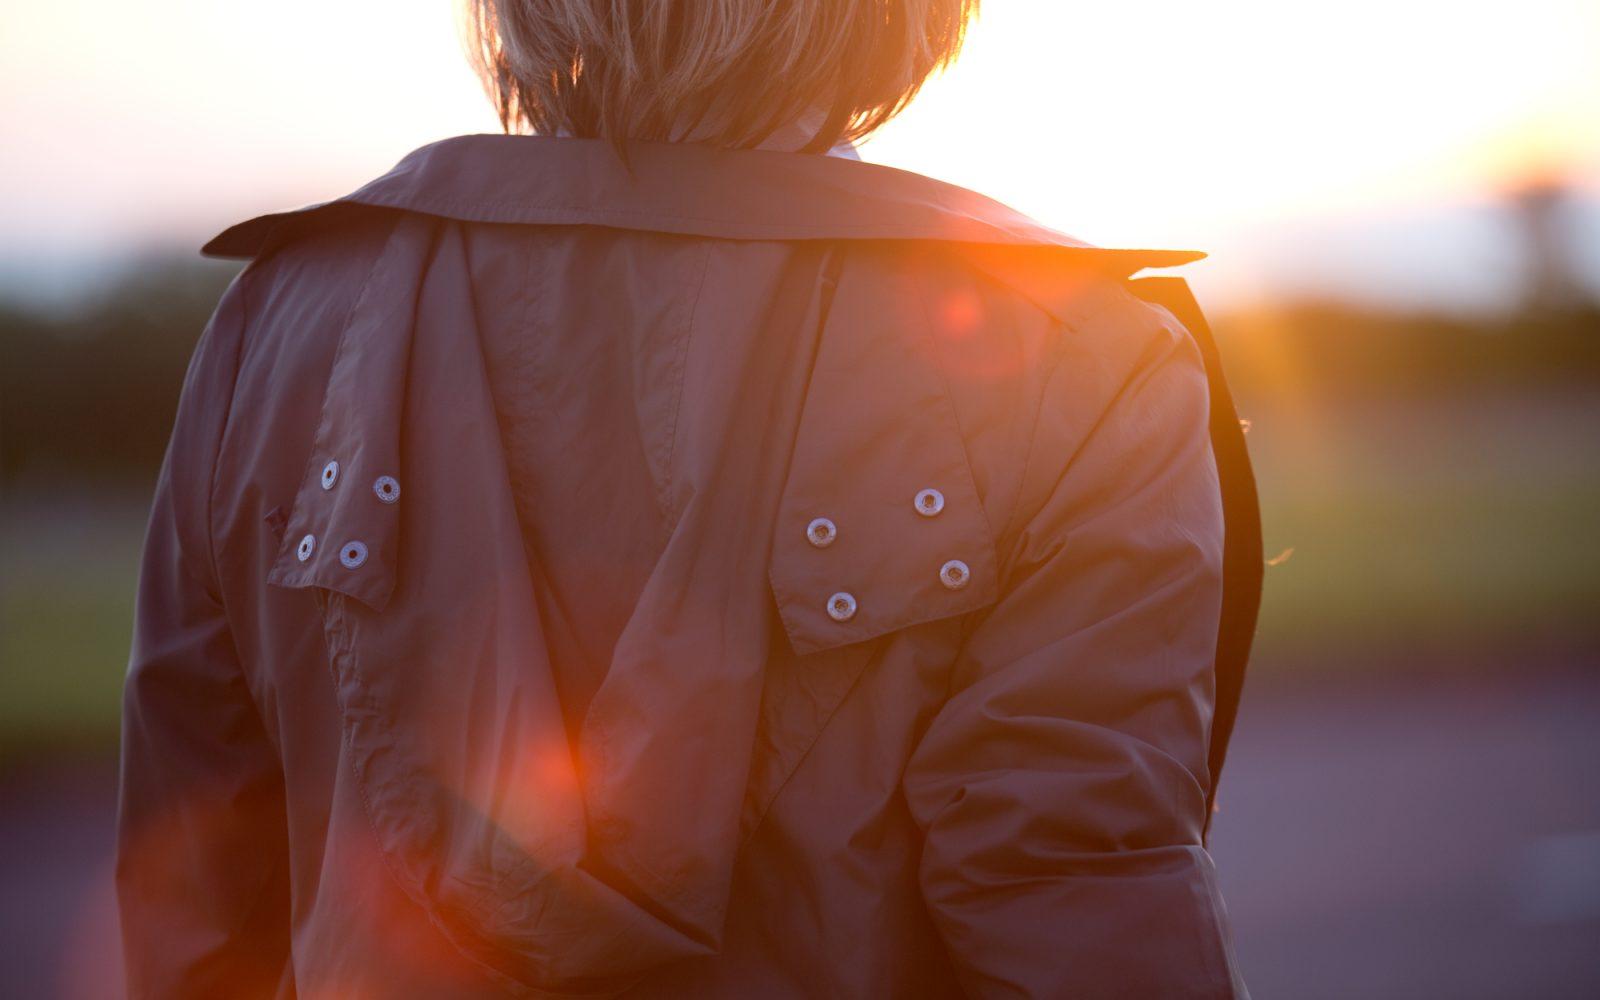 PAQME_MaypoleProductions_BlackLongRaincoat_BackOfShouldersDusk_05